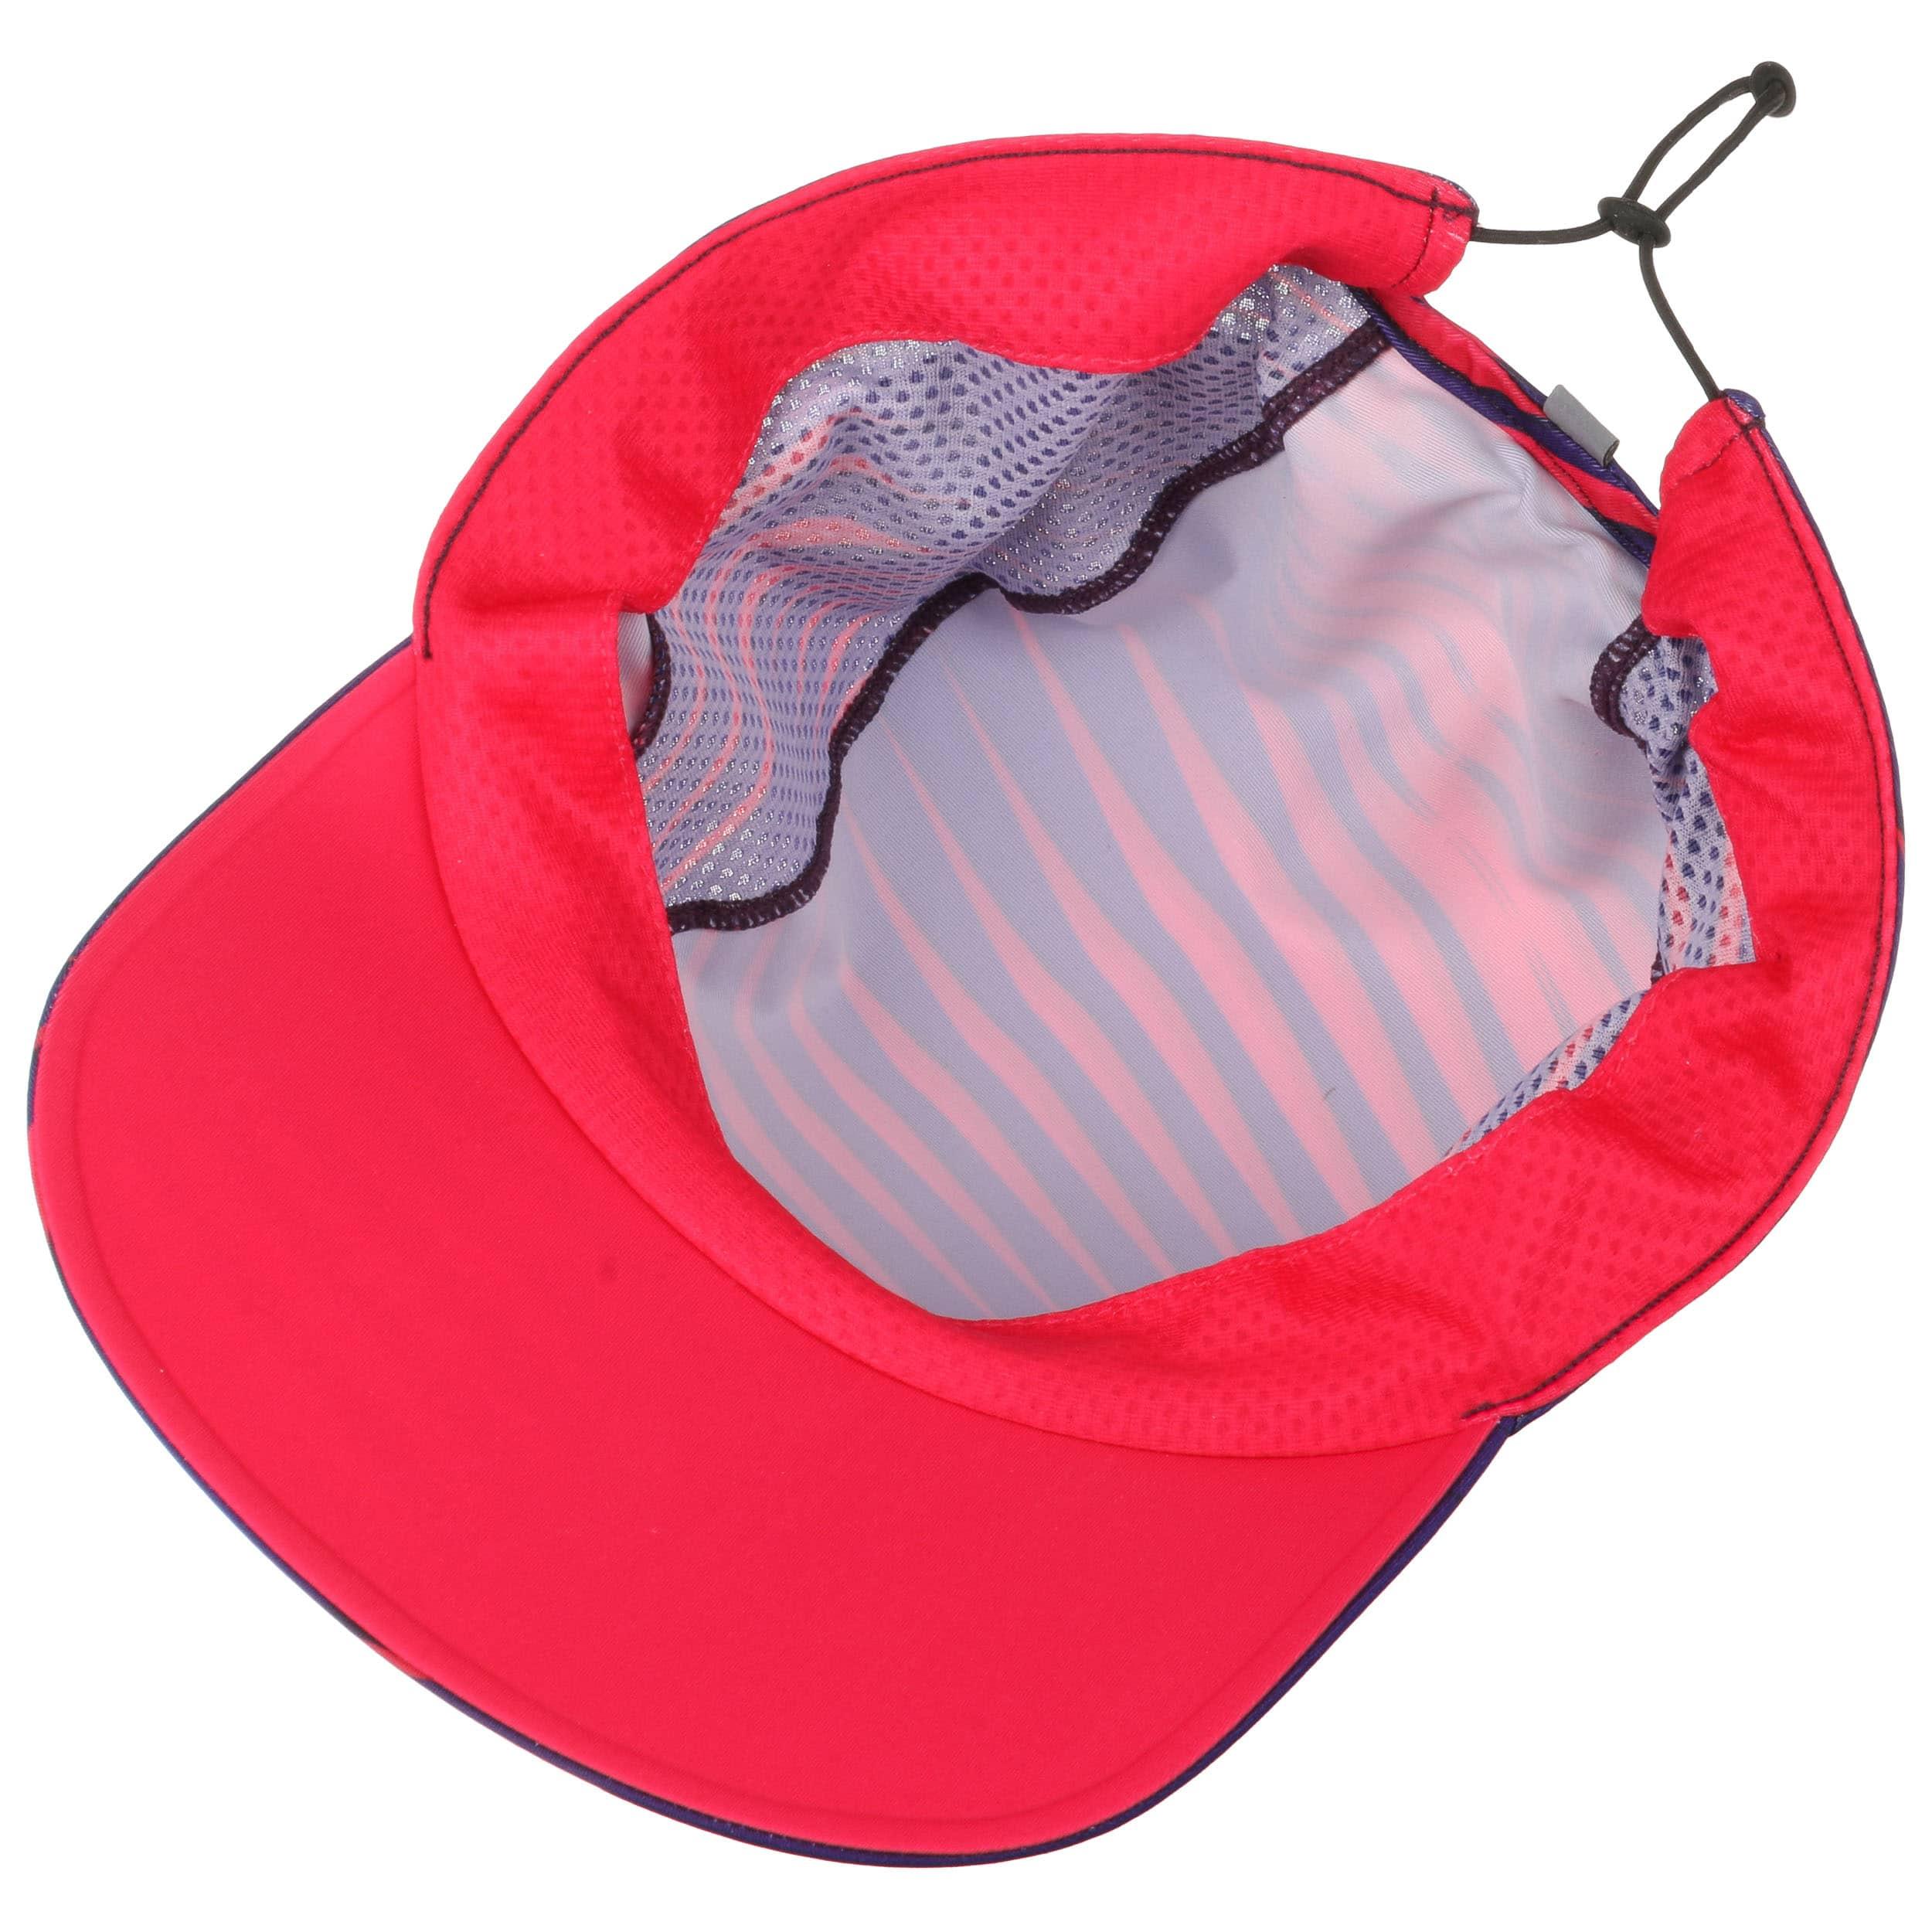 ... R-Optical Pink Pack Run Cap by BUFF - pink 2 ... b6e49f72f6